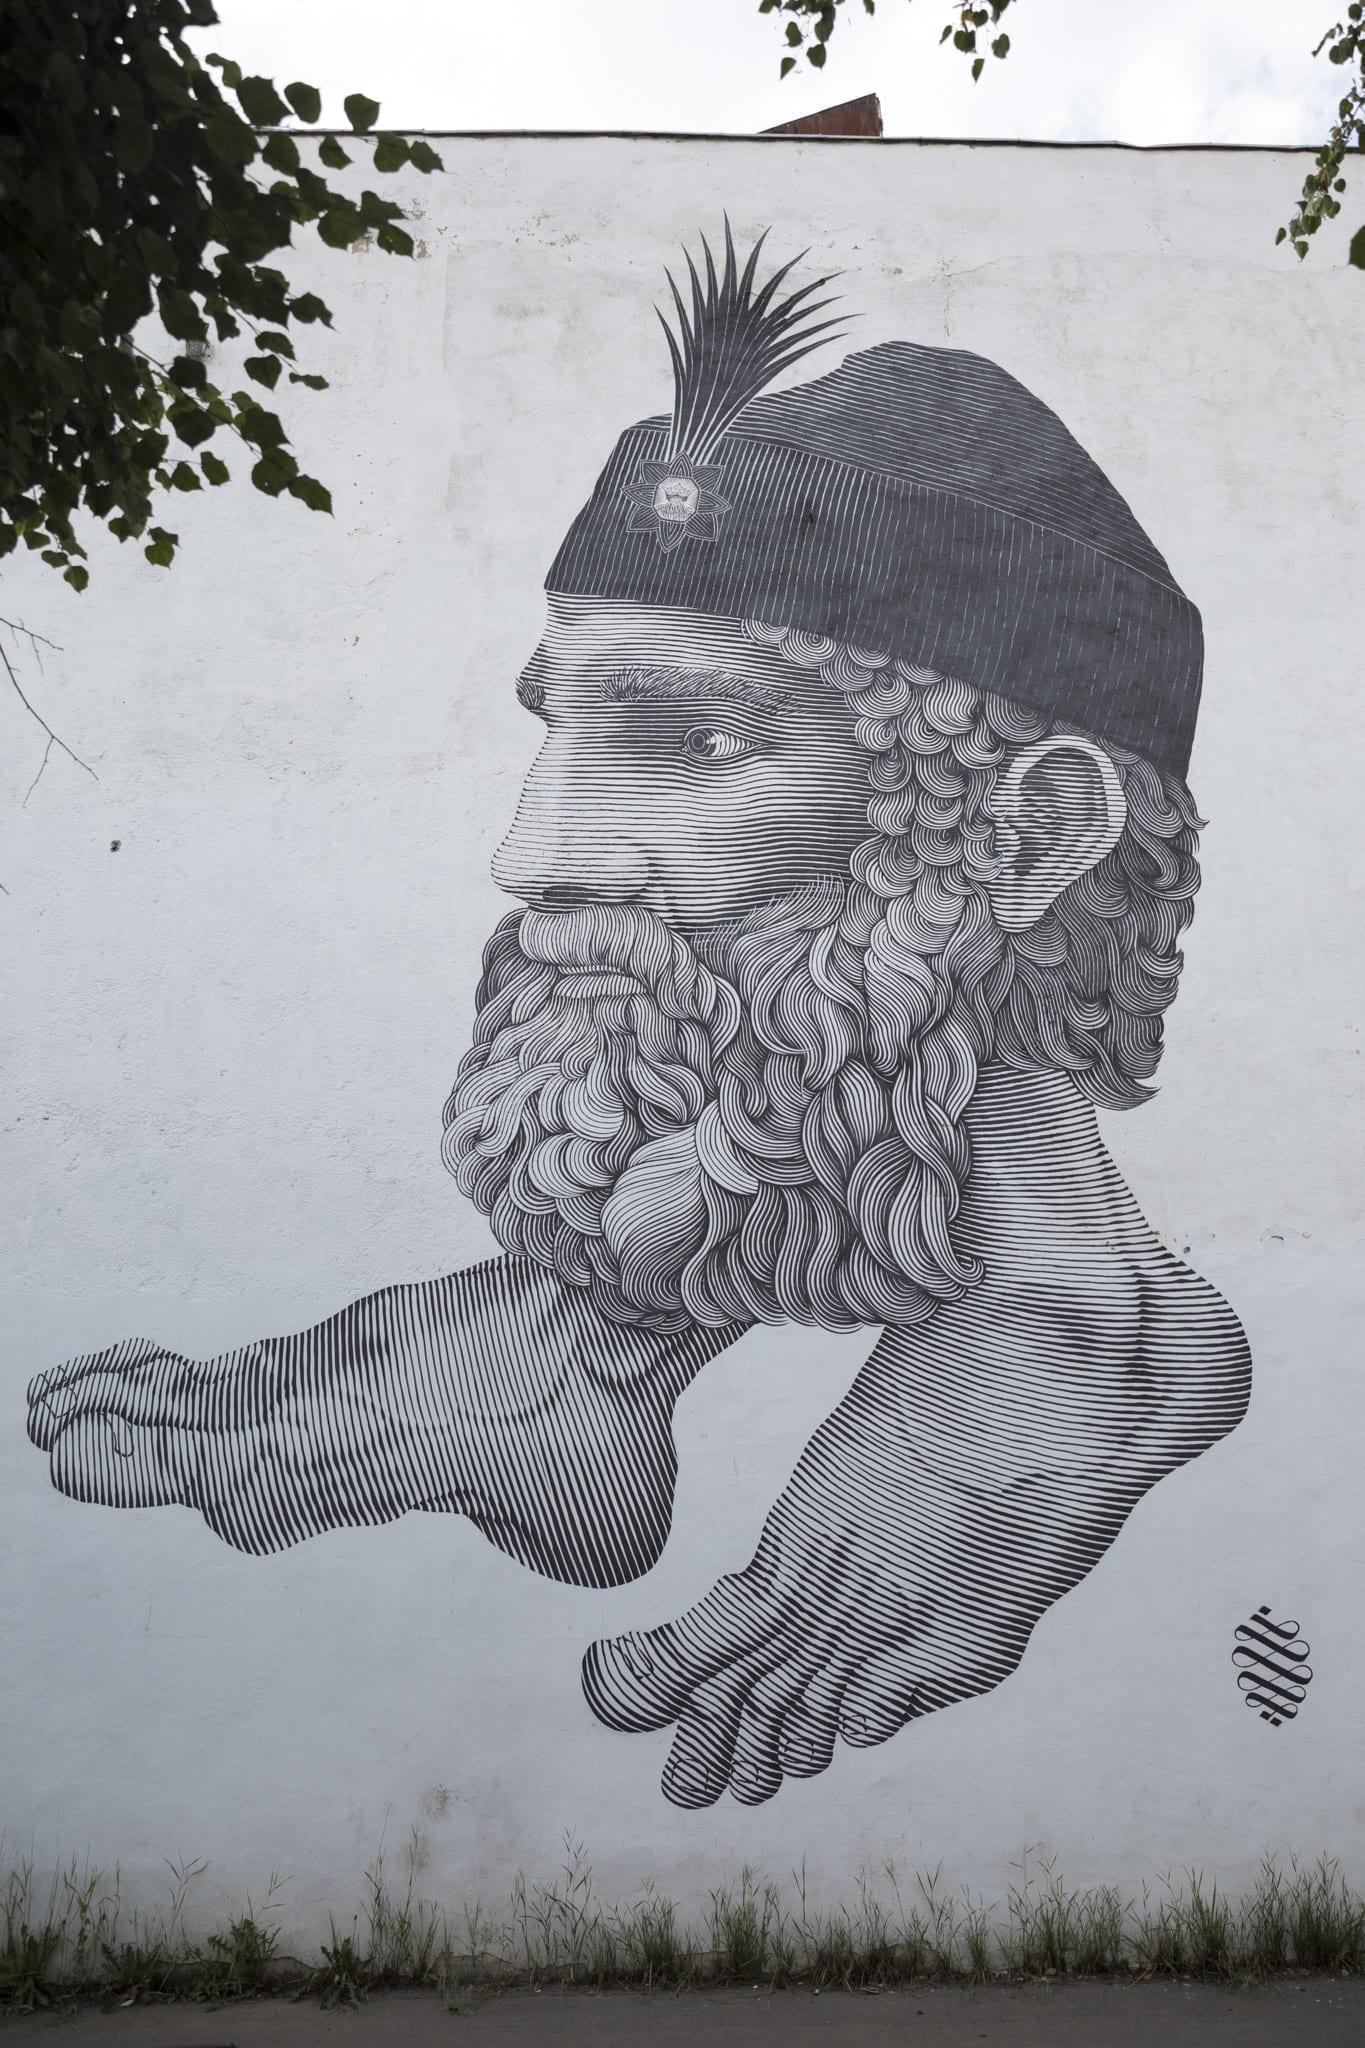 NICOLÁS SÁNCHEZ ALFALFA (n. Venezuela / Uruguay) / 2018 Brasov Un-hidden street art in Romania